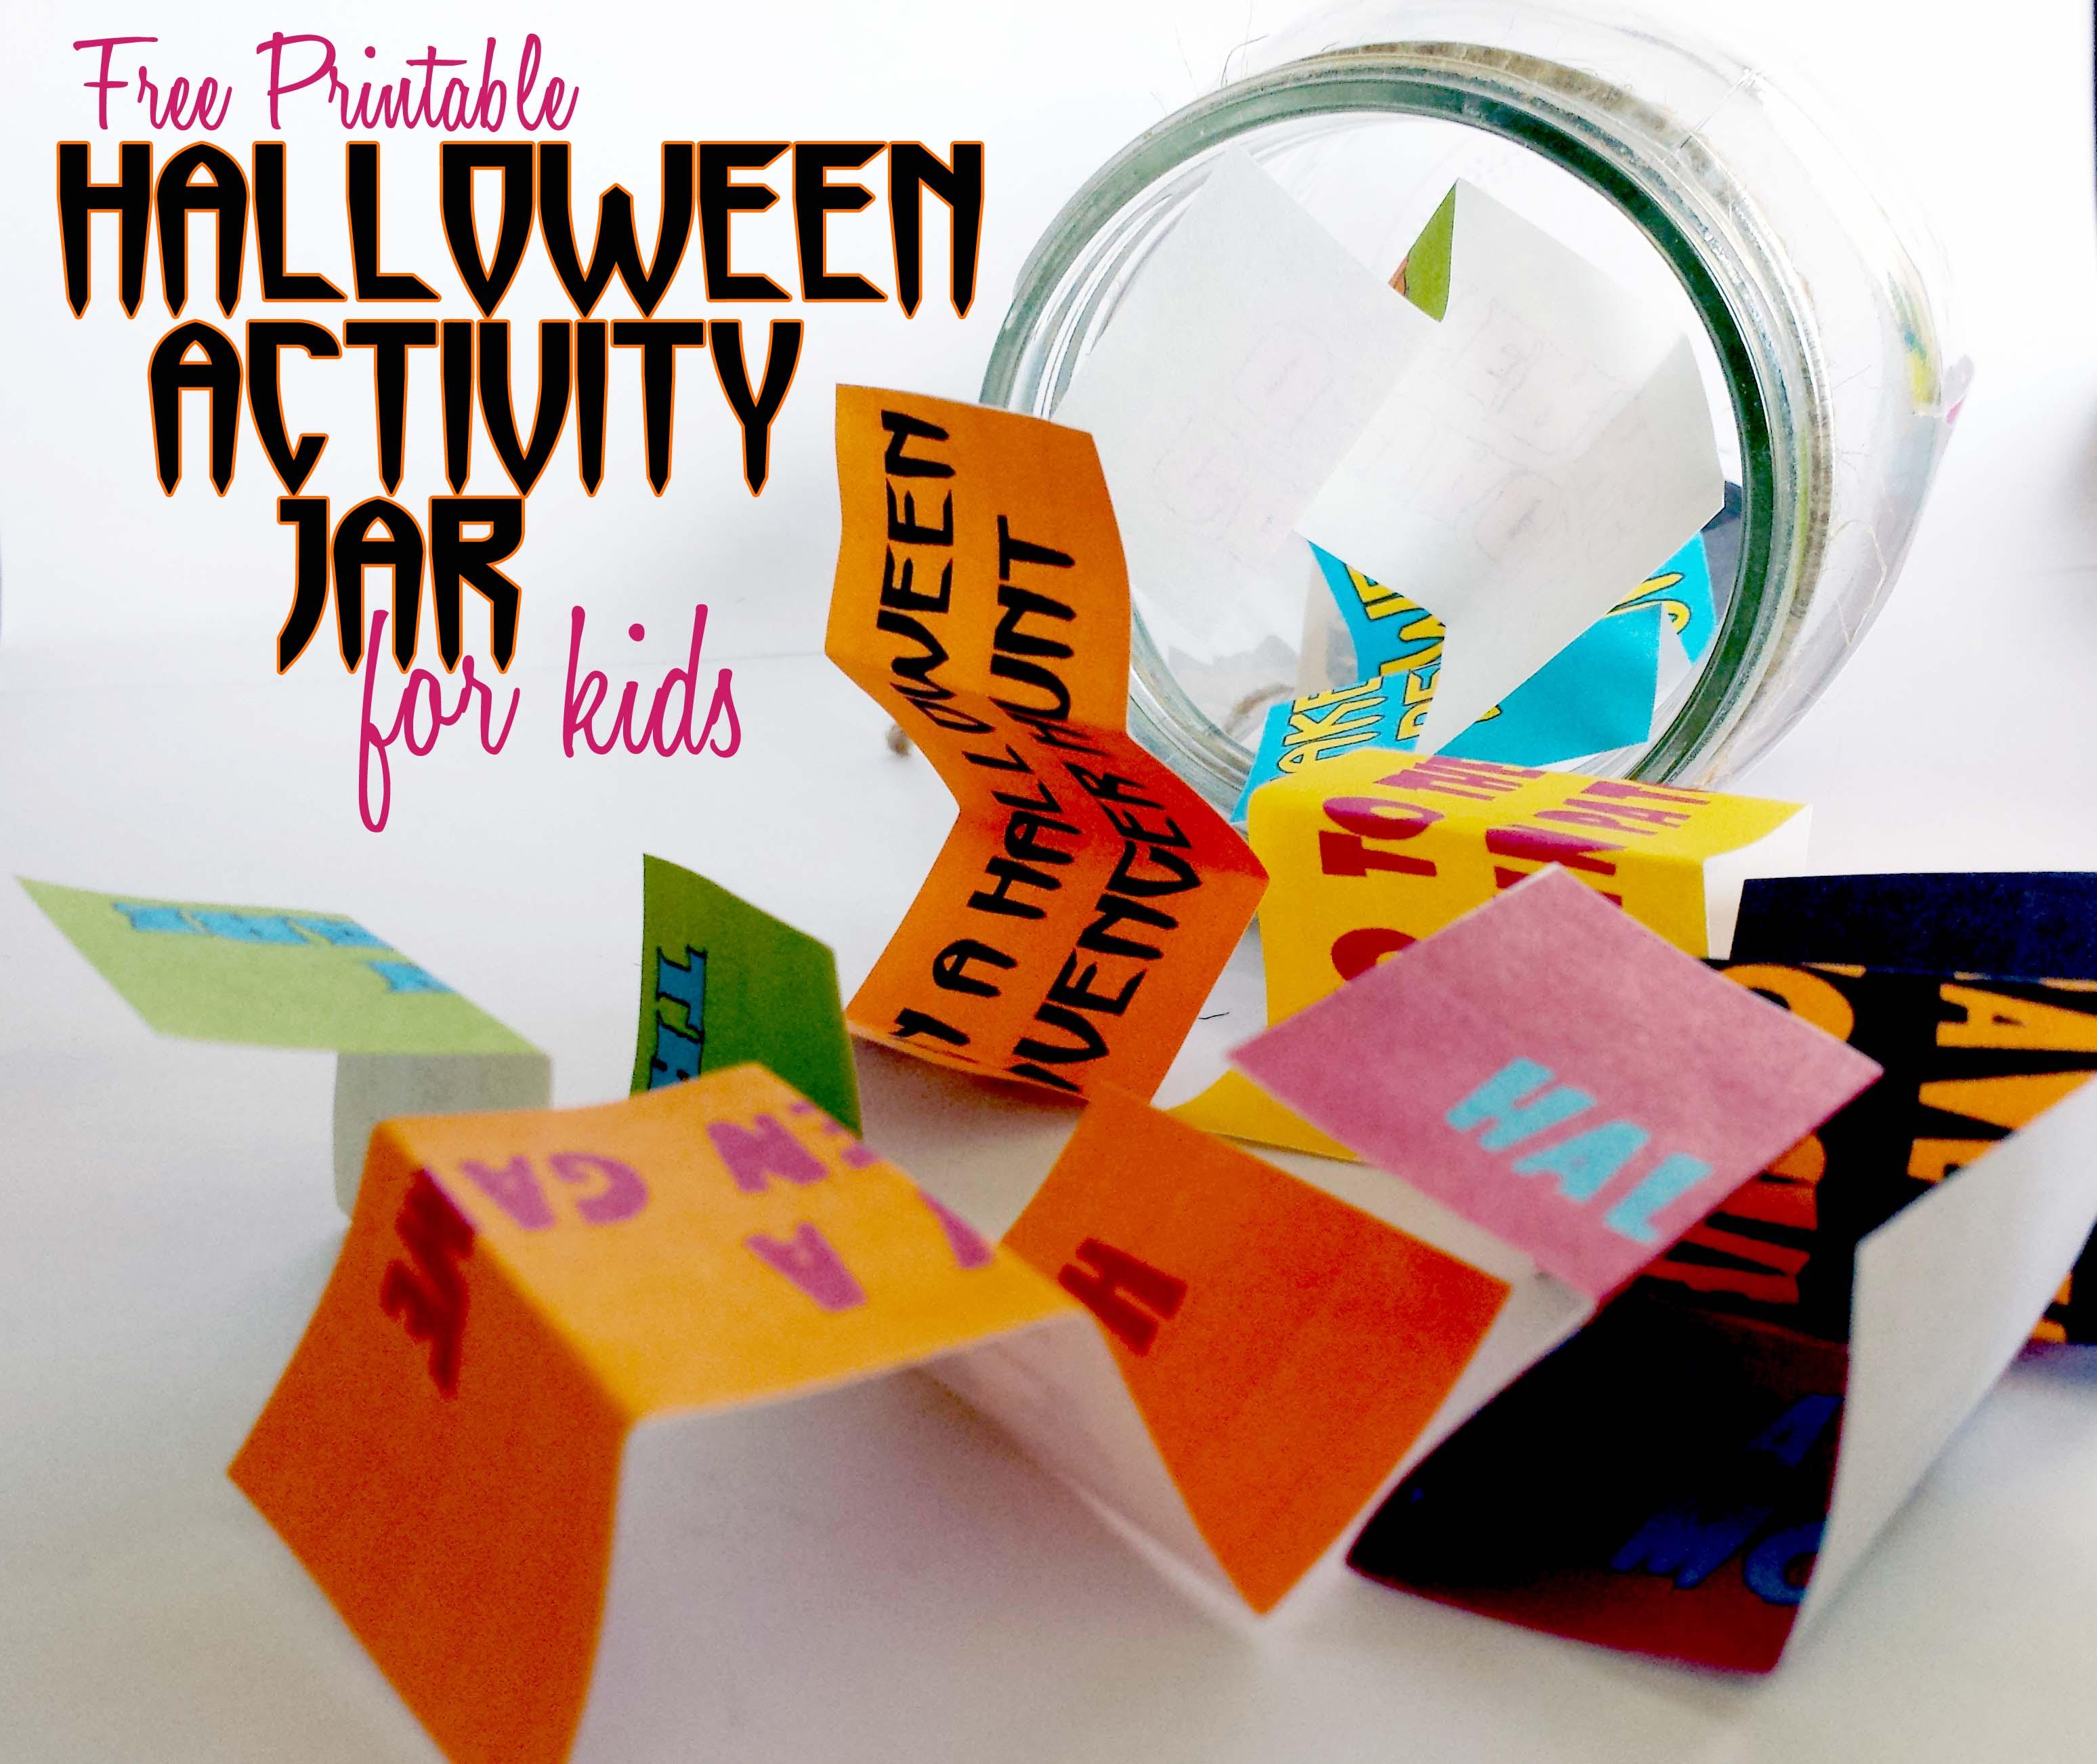 Kids' Halloween Activity Jar